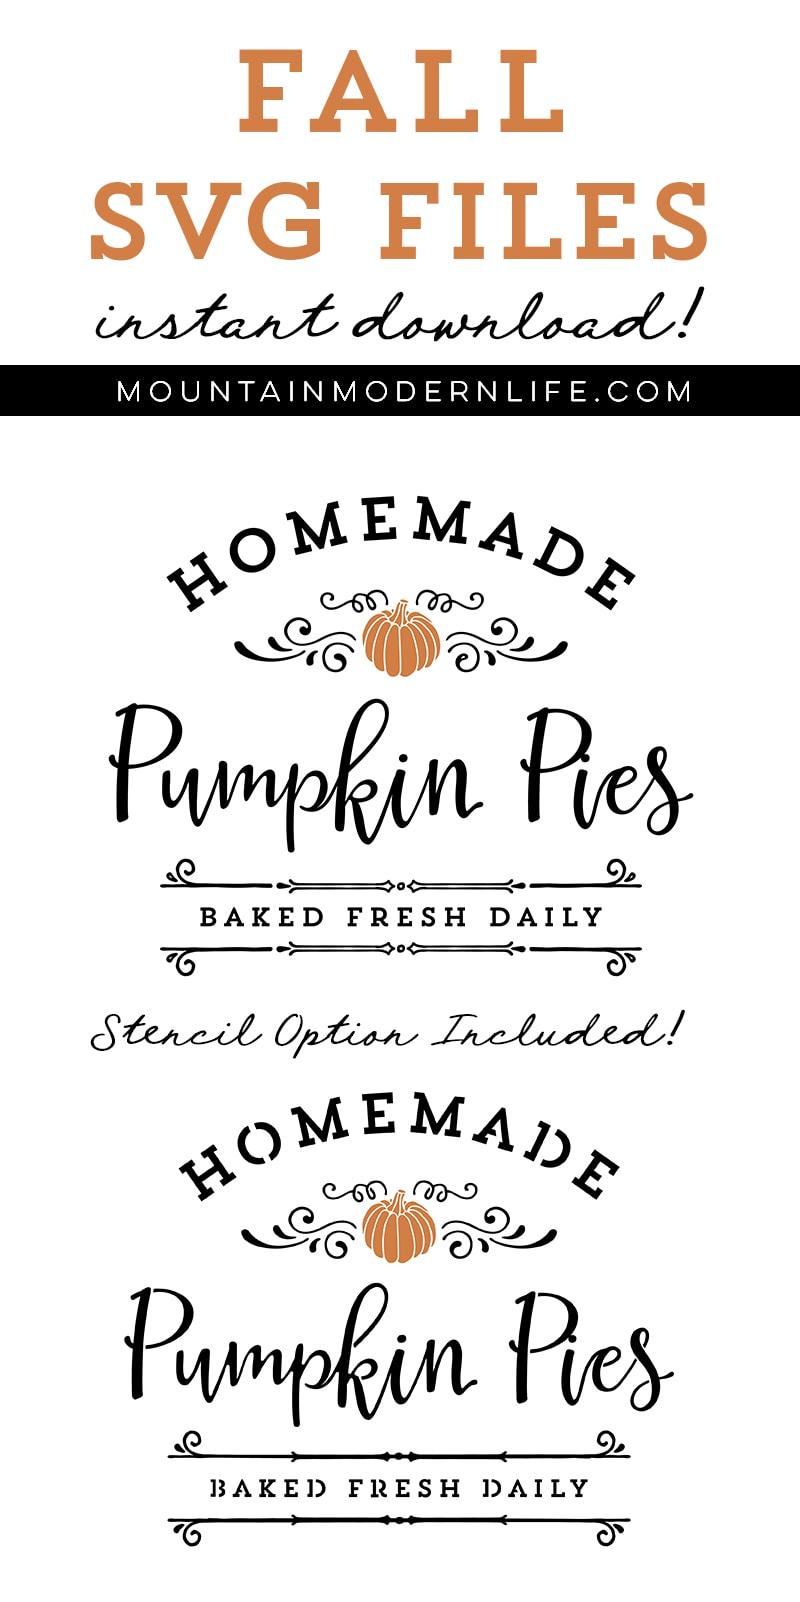 SVG Files: Farm Fresh Pumpkin Pies   MountainModernLife.com